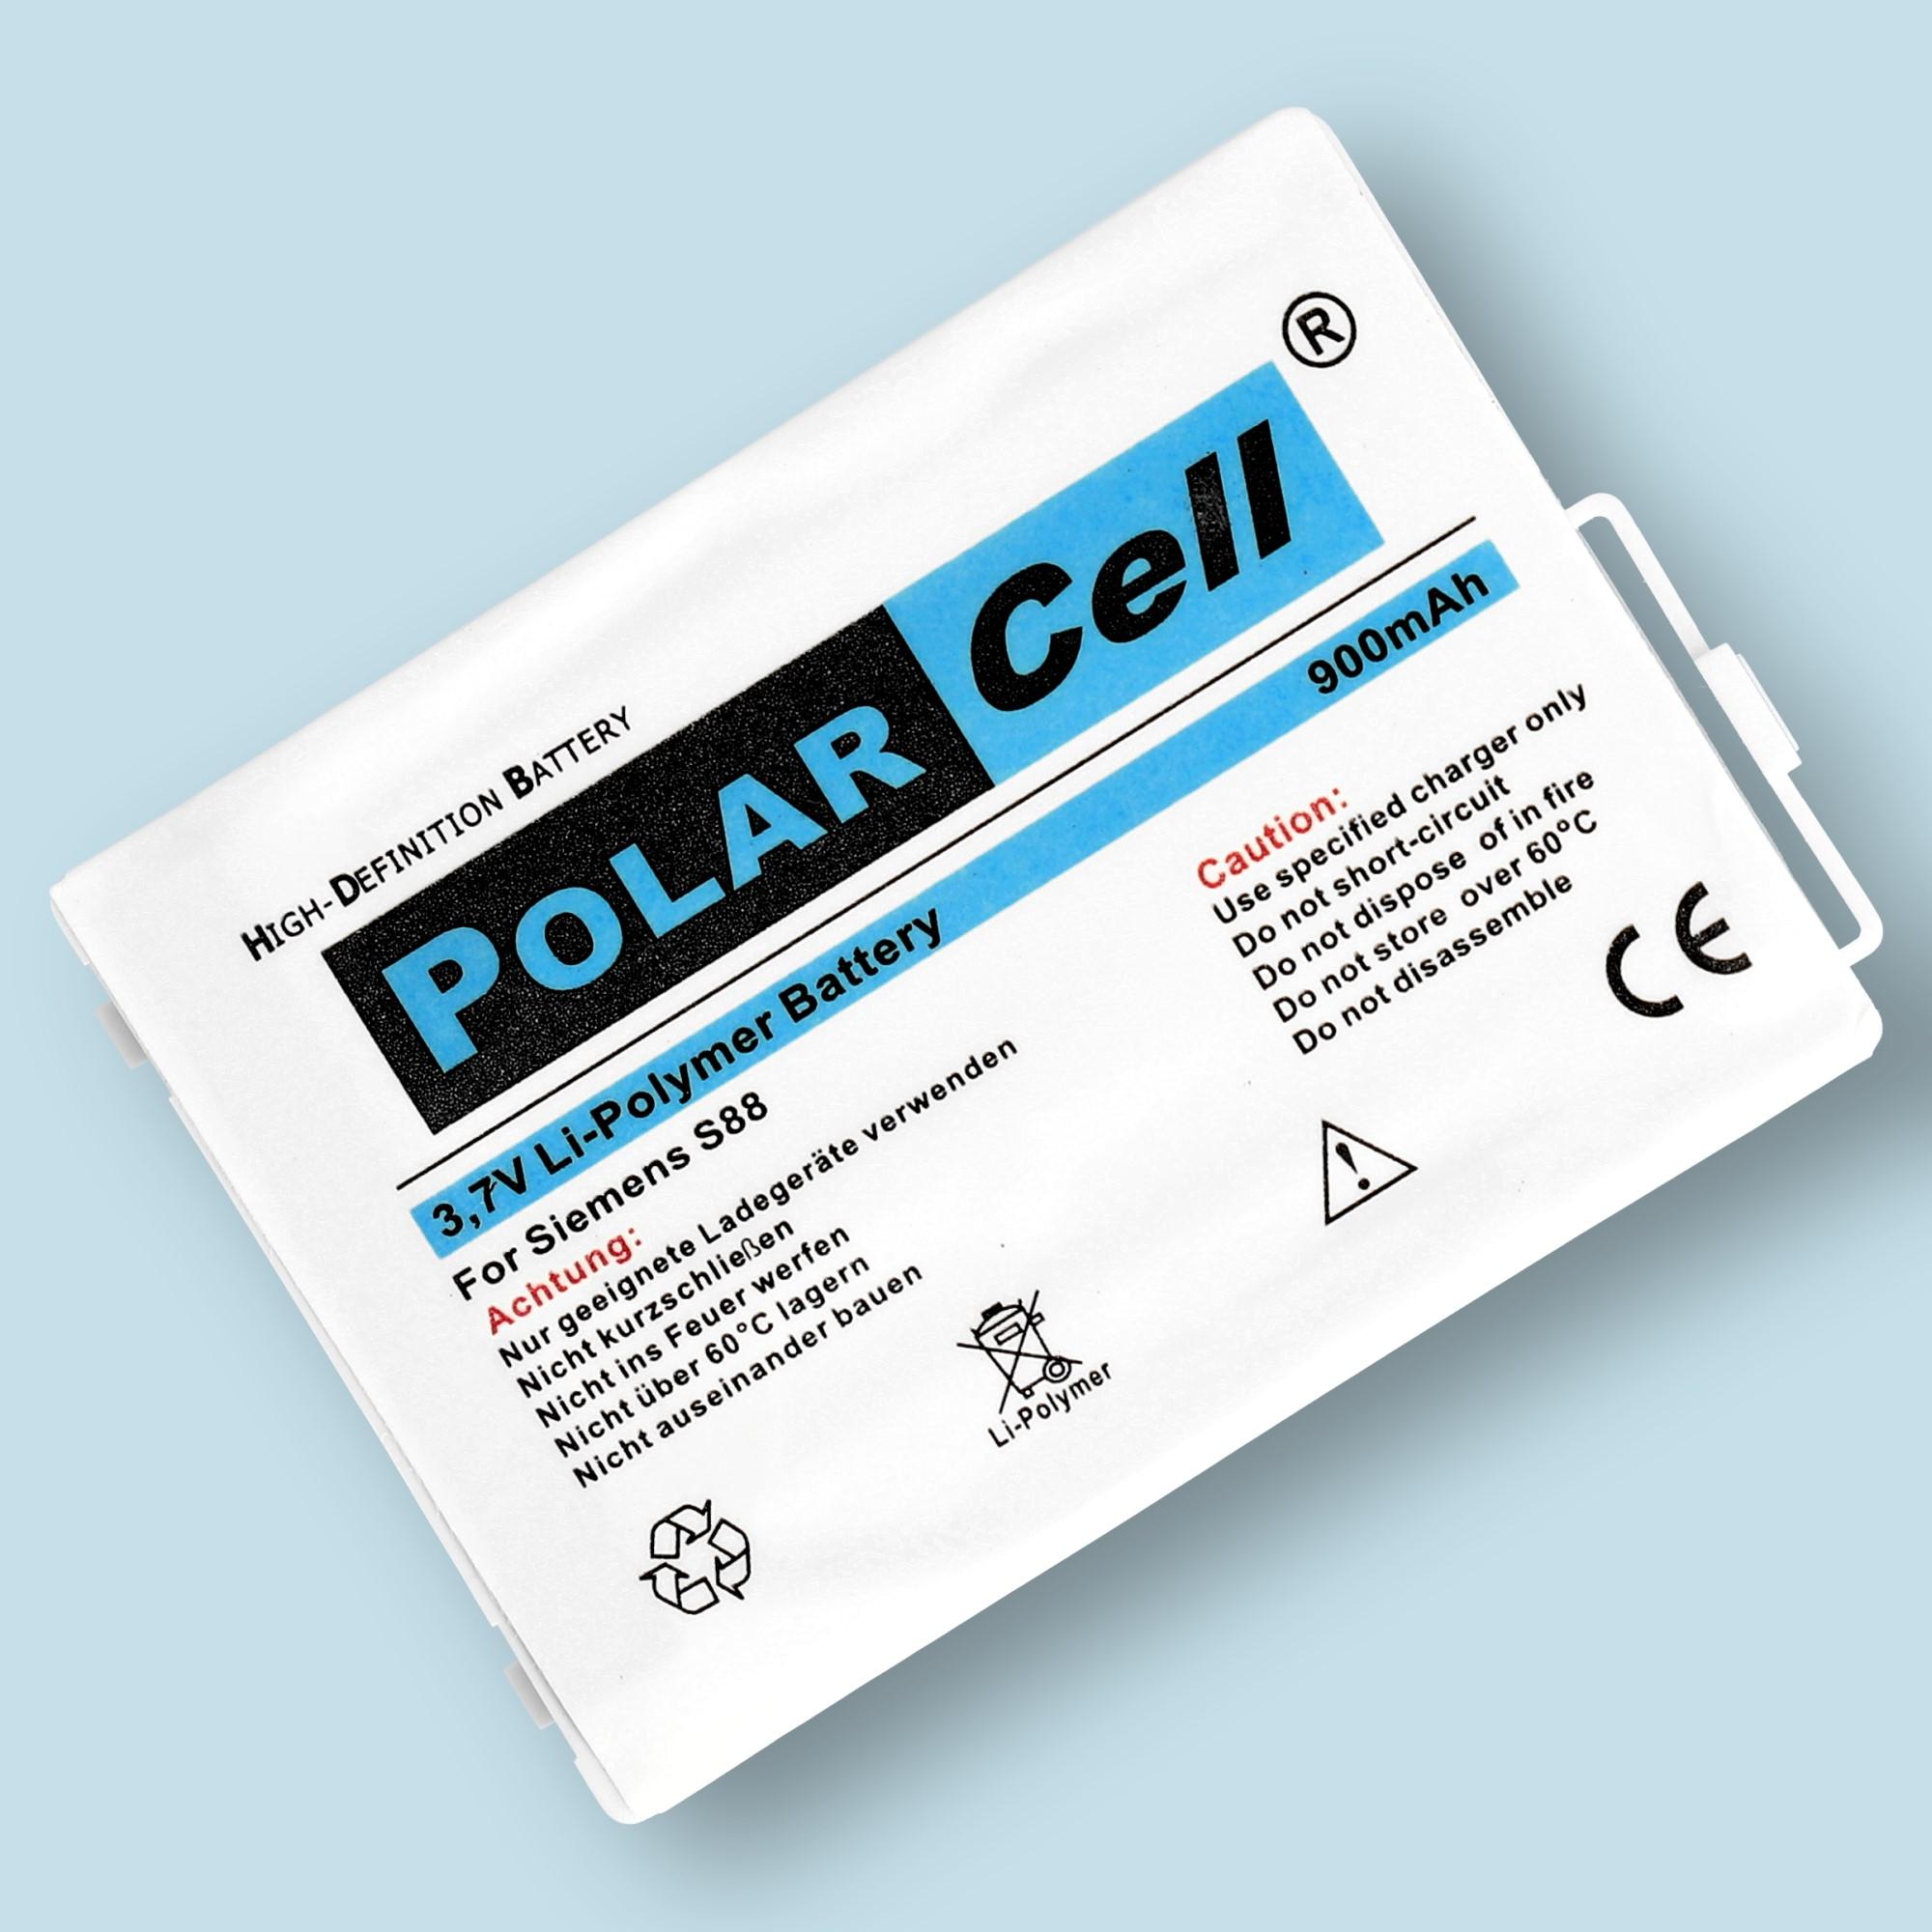 PolarCell Hochleistungs-Akku ersetzt Originalakku BenQ-Siemens PLI-104